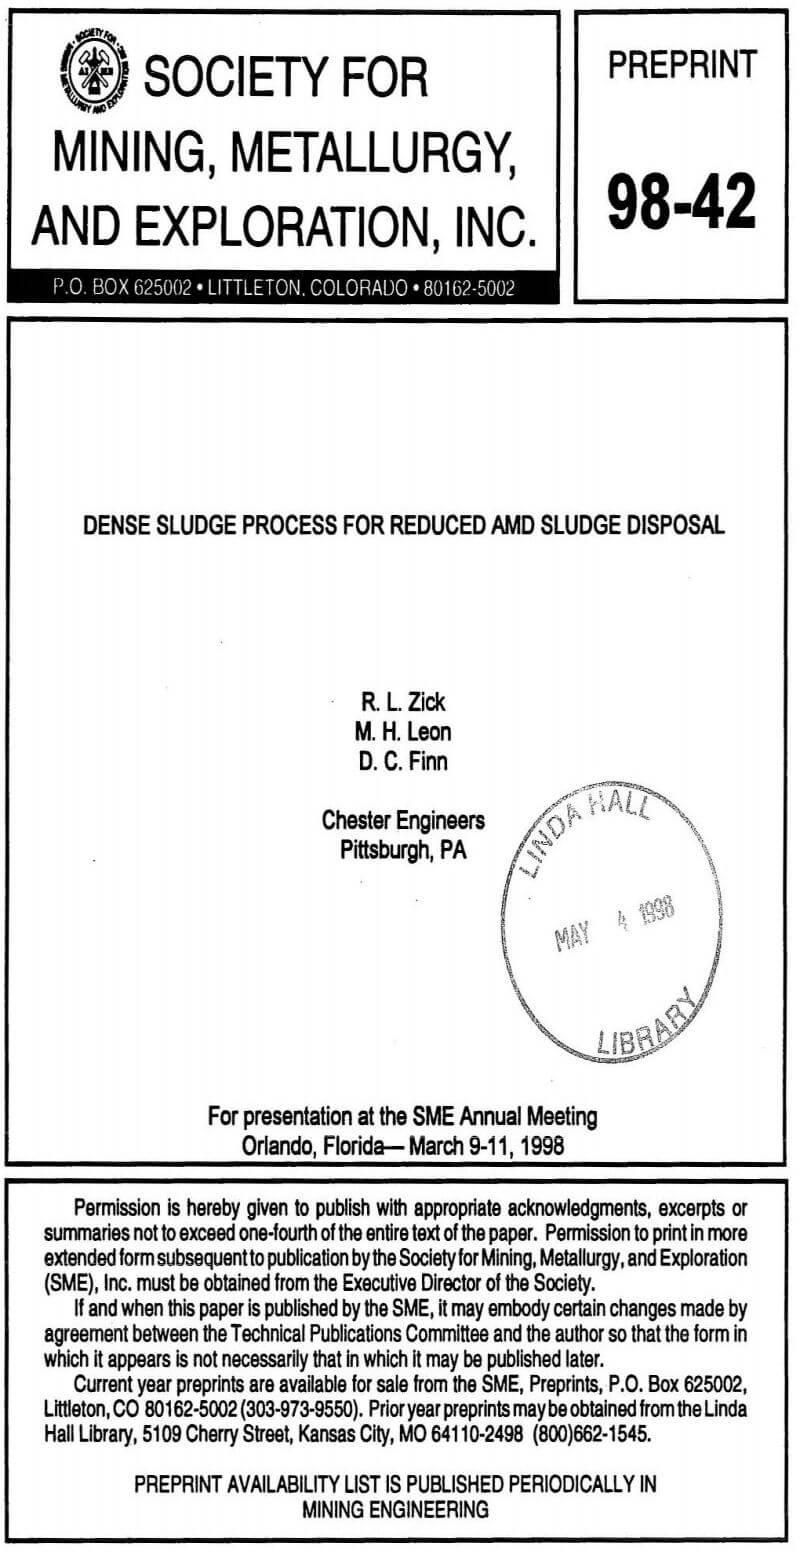 dense sludge process for reduced and sludge disposal